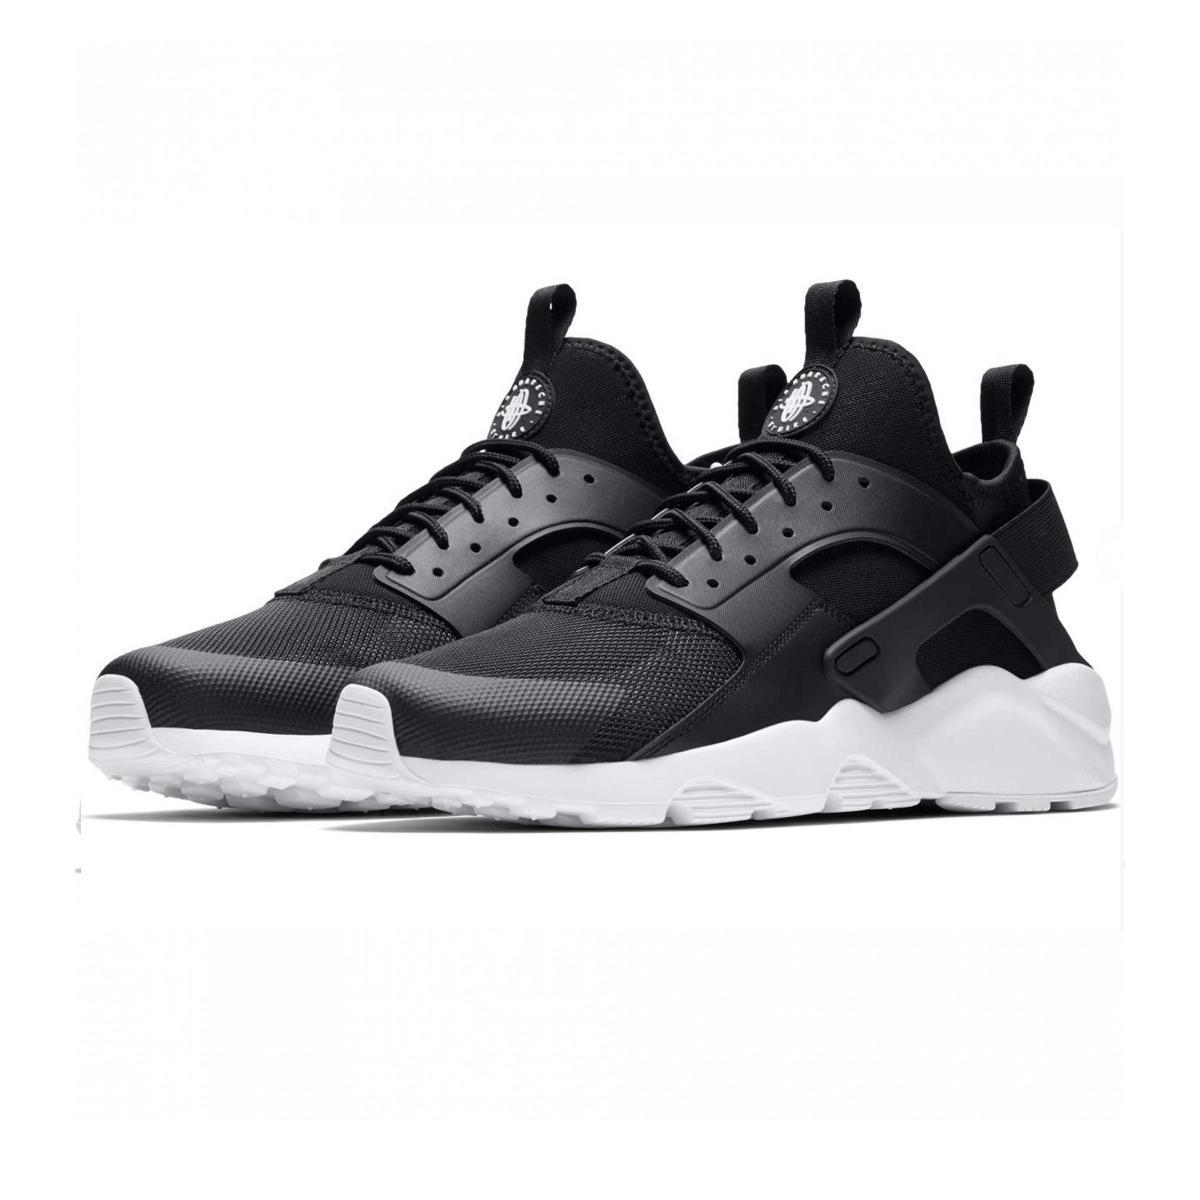 Scarpe Nike Air Huarache Run Ultra Nero Bianco Uomo 819685-016